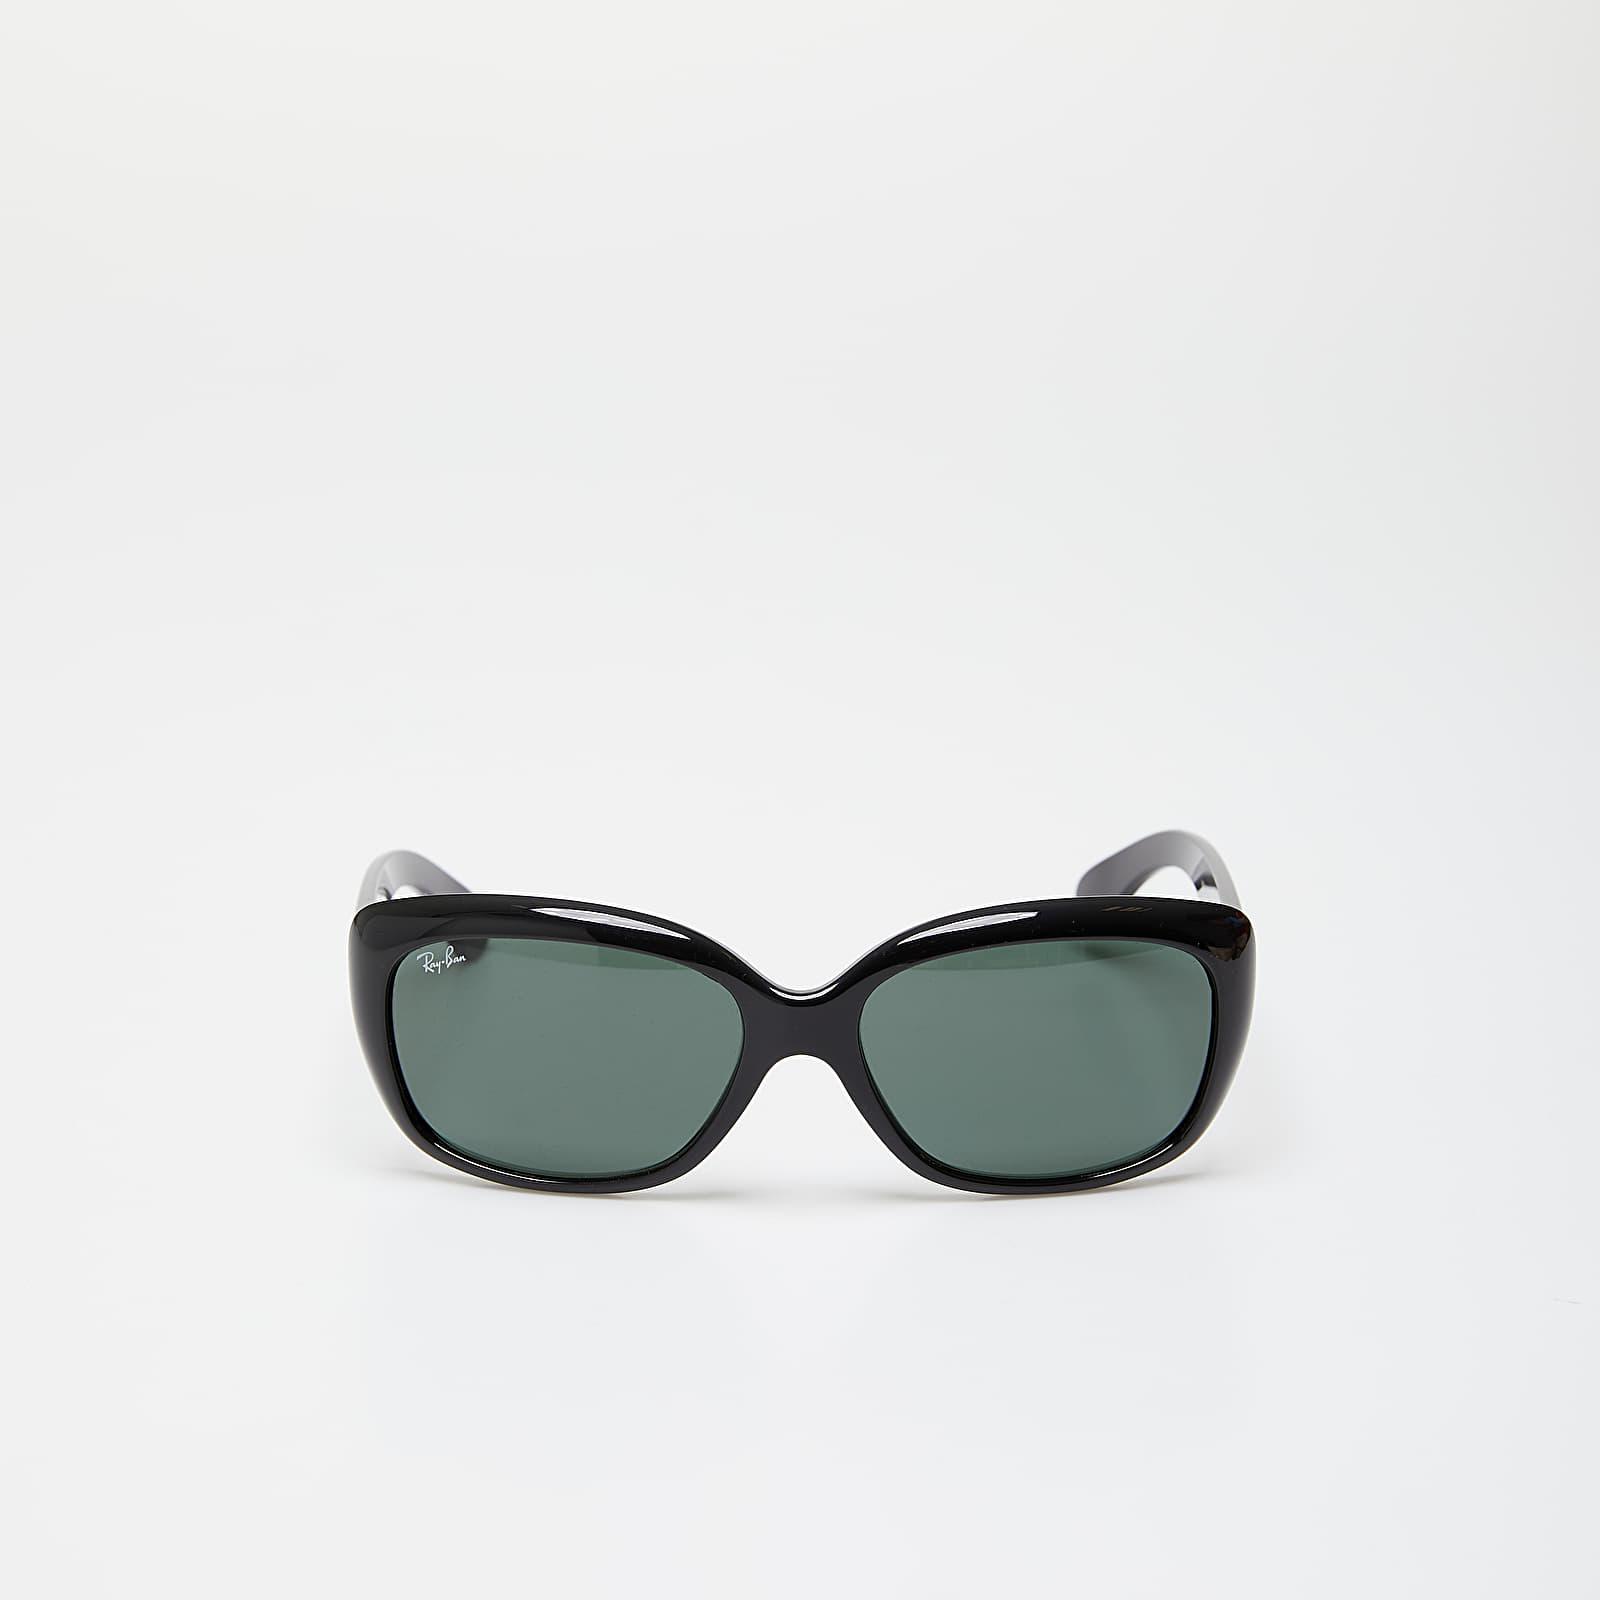 Ray Ban Jackie Ohh Sunglasses